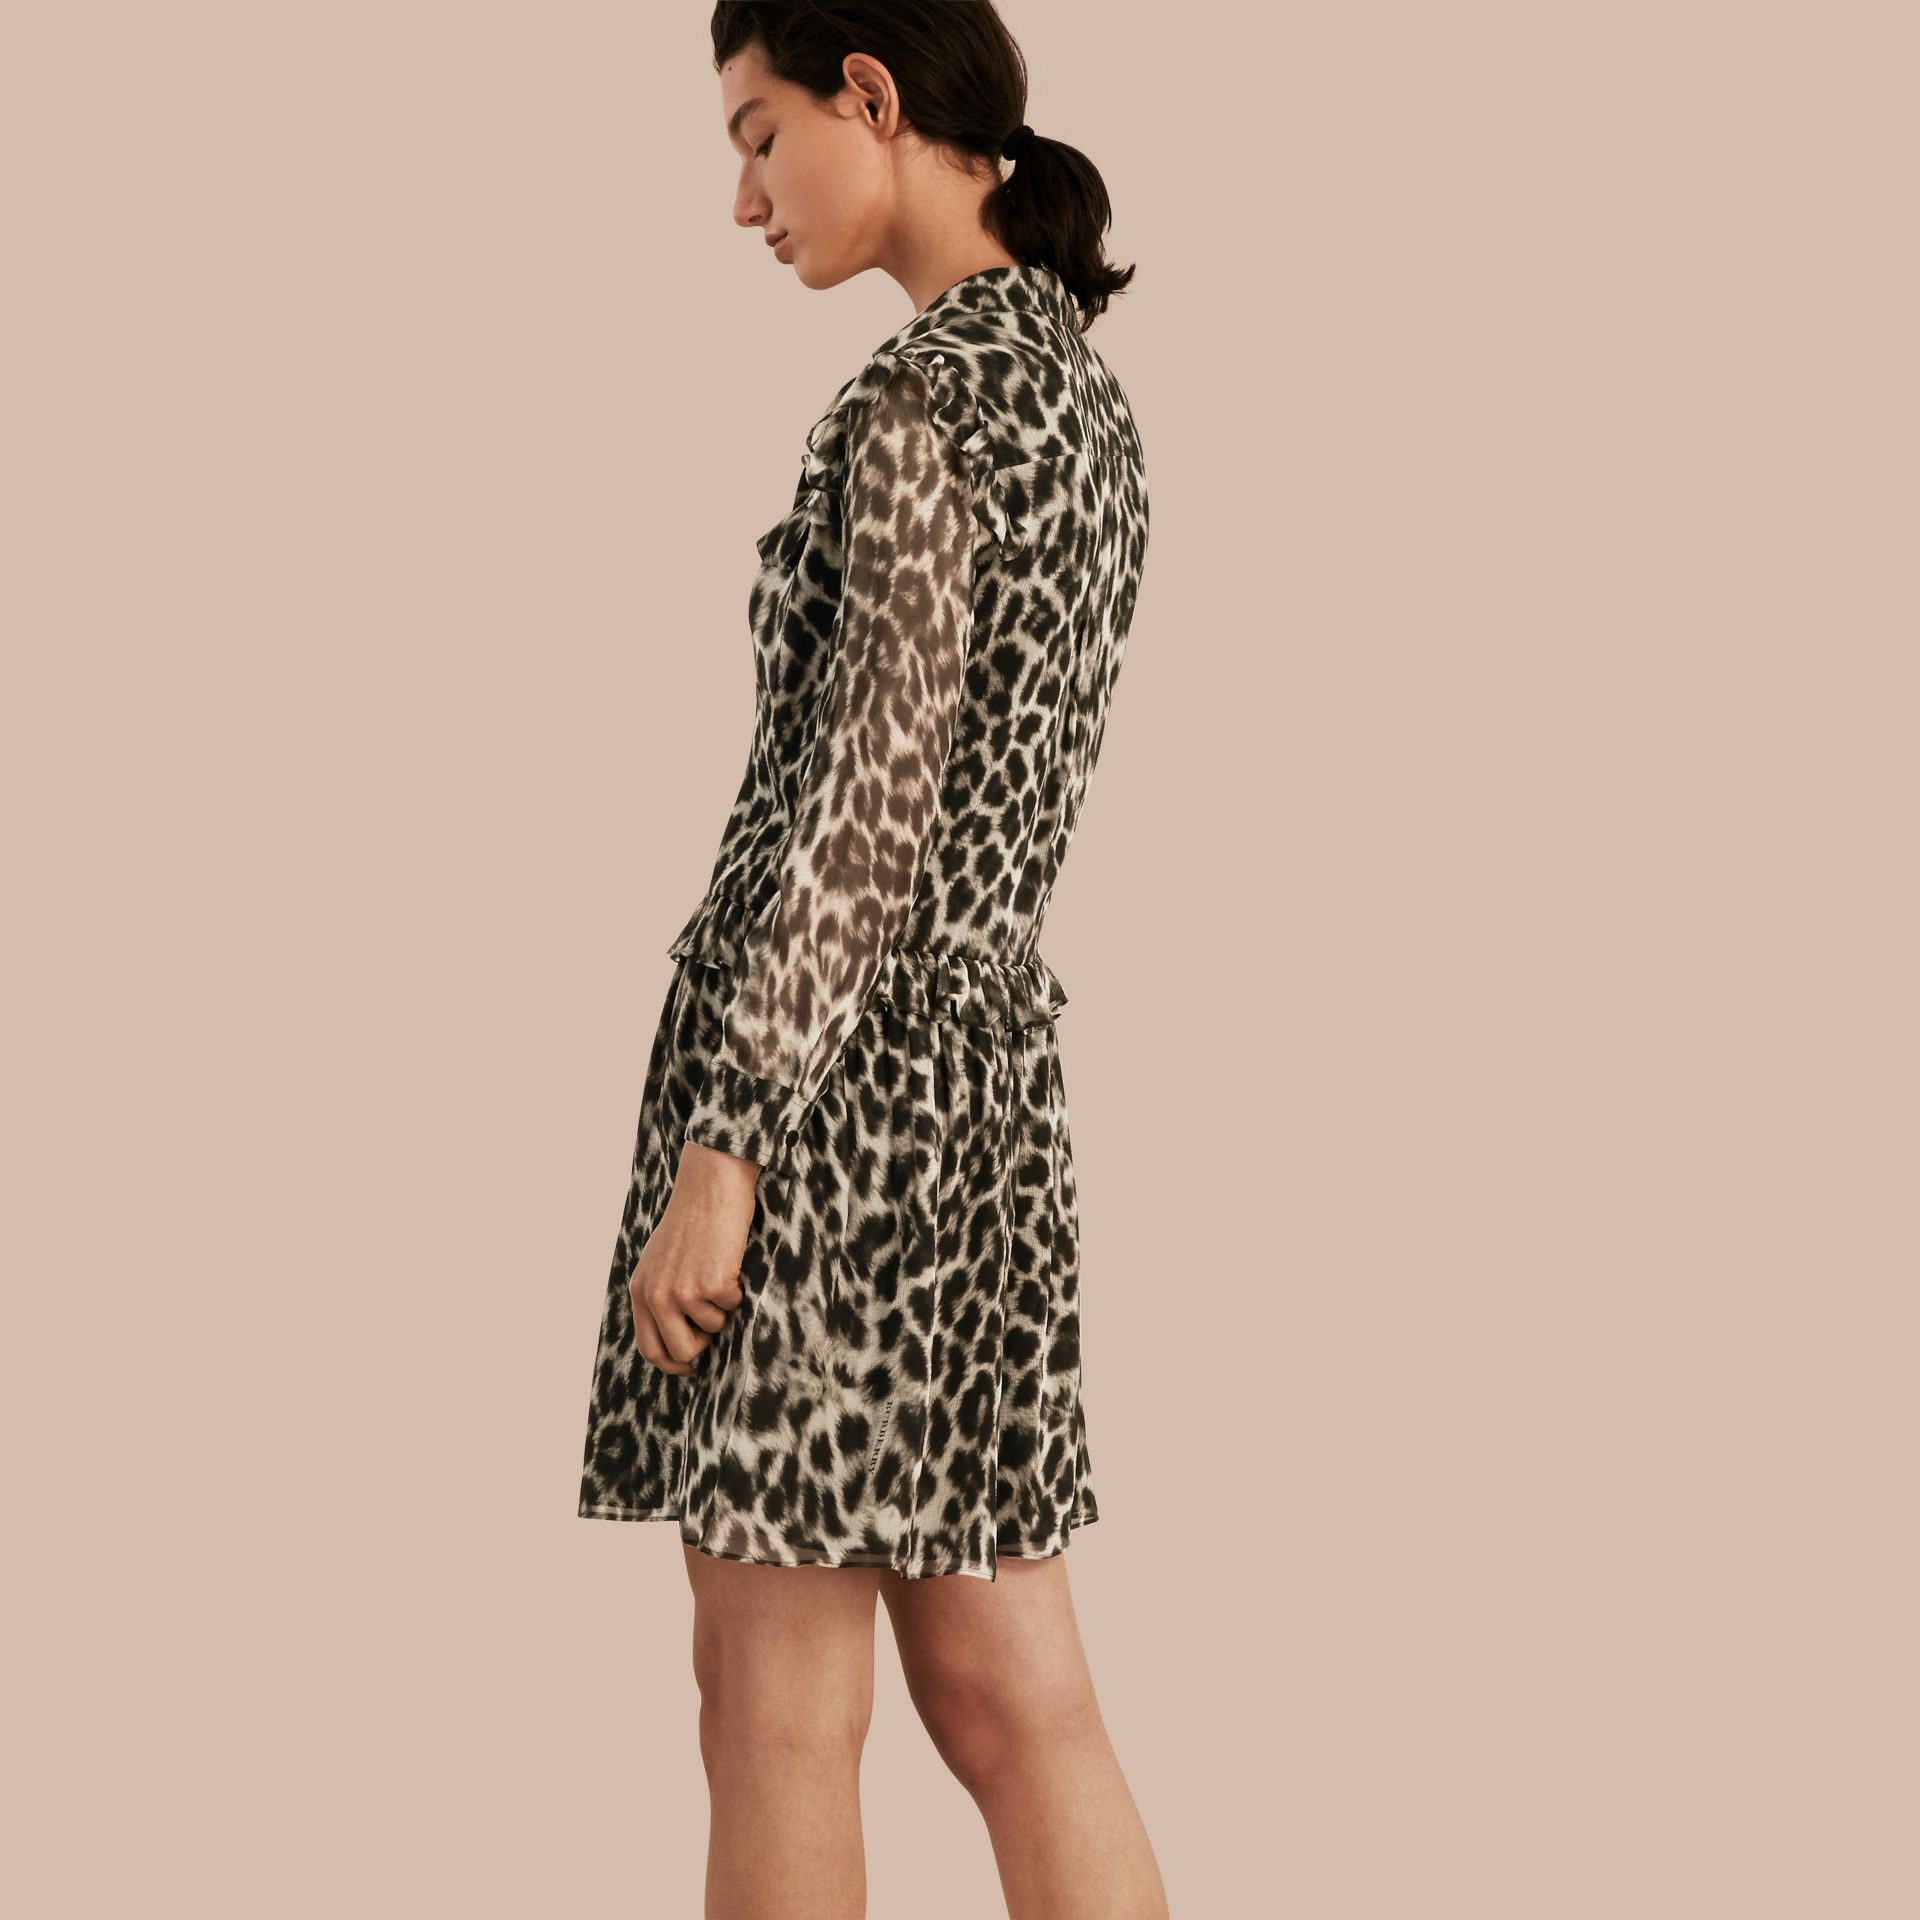 Ruffle Detail Animal Print Silk Dress - gallery image 3